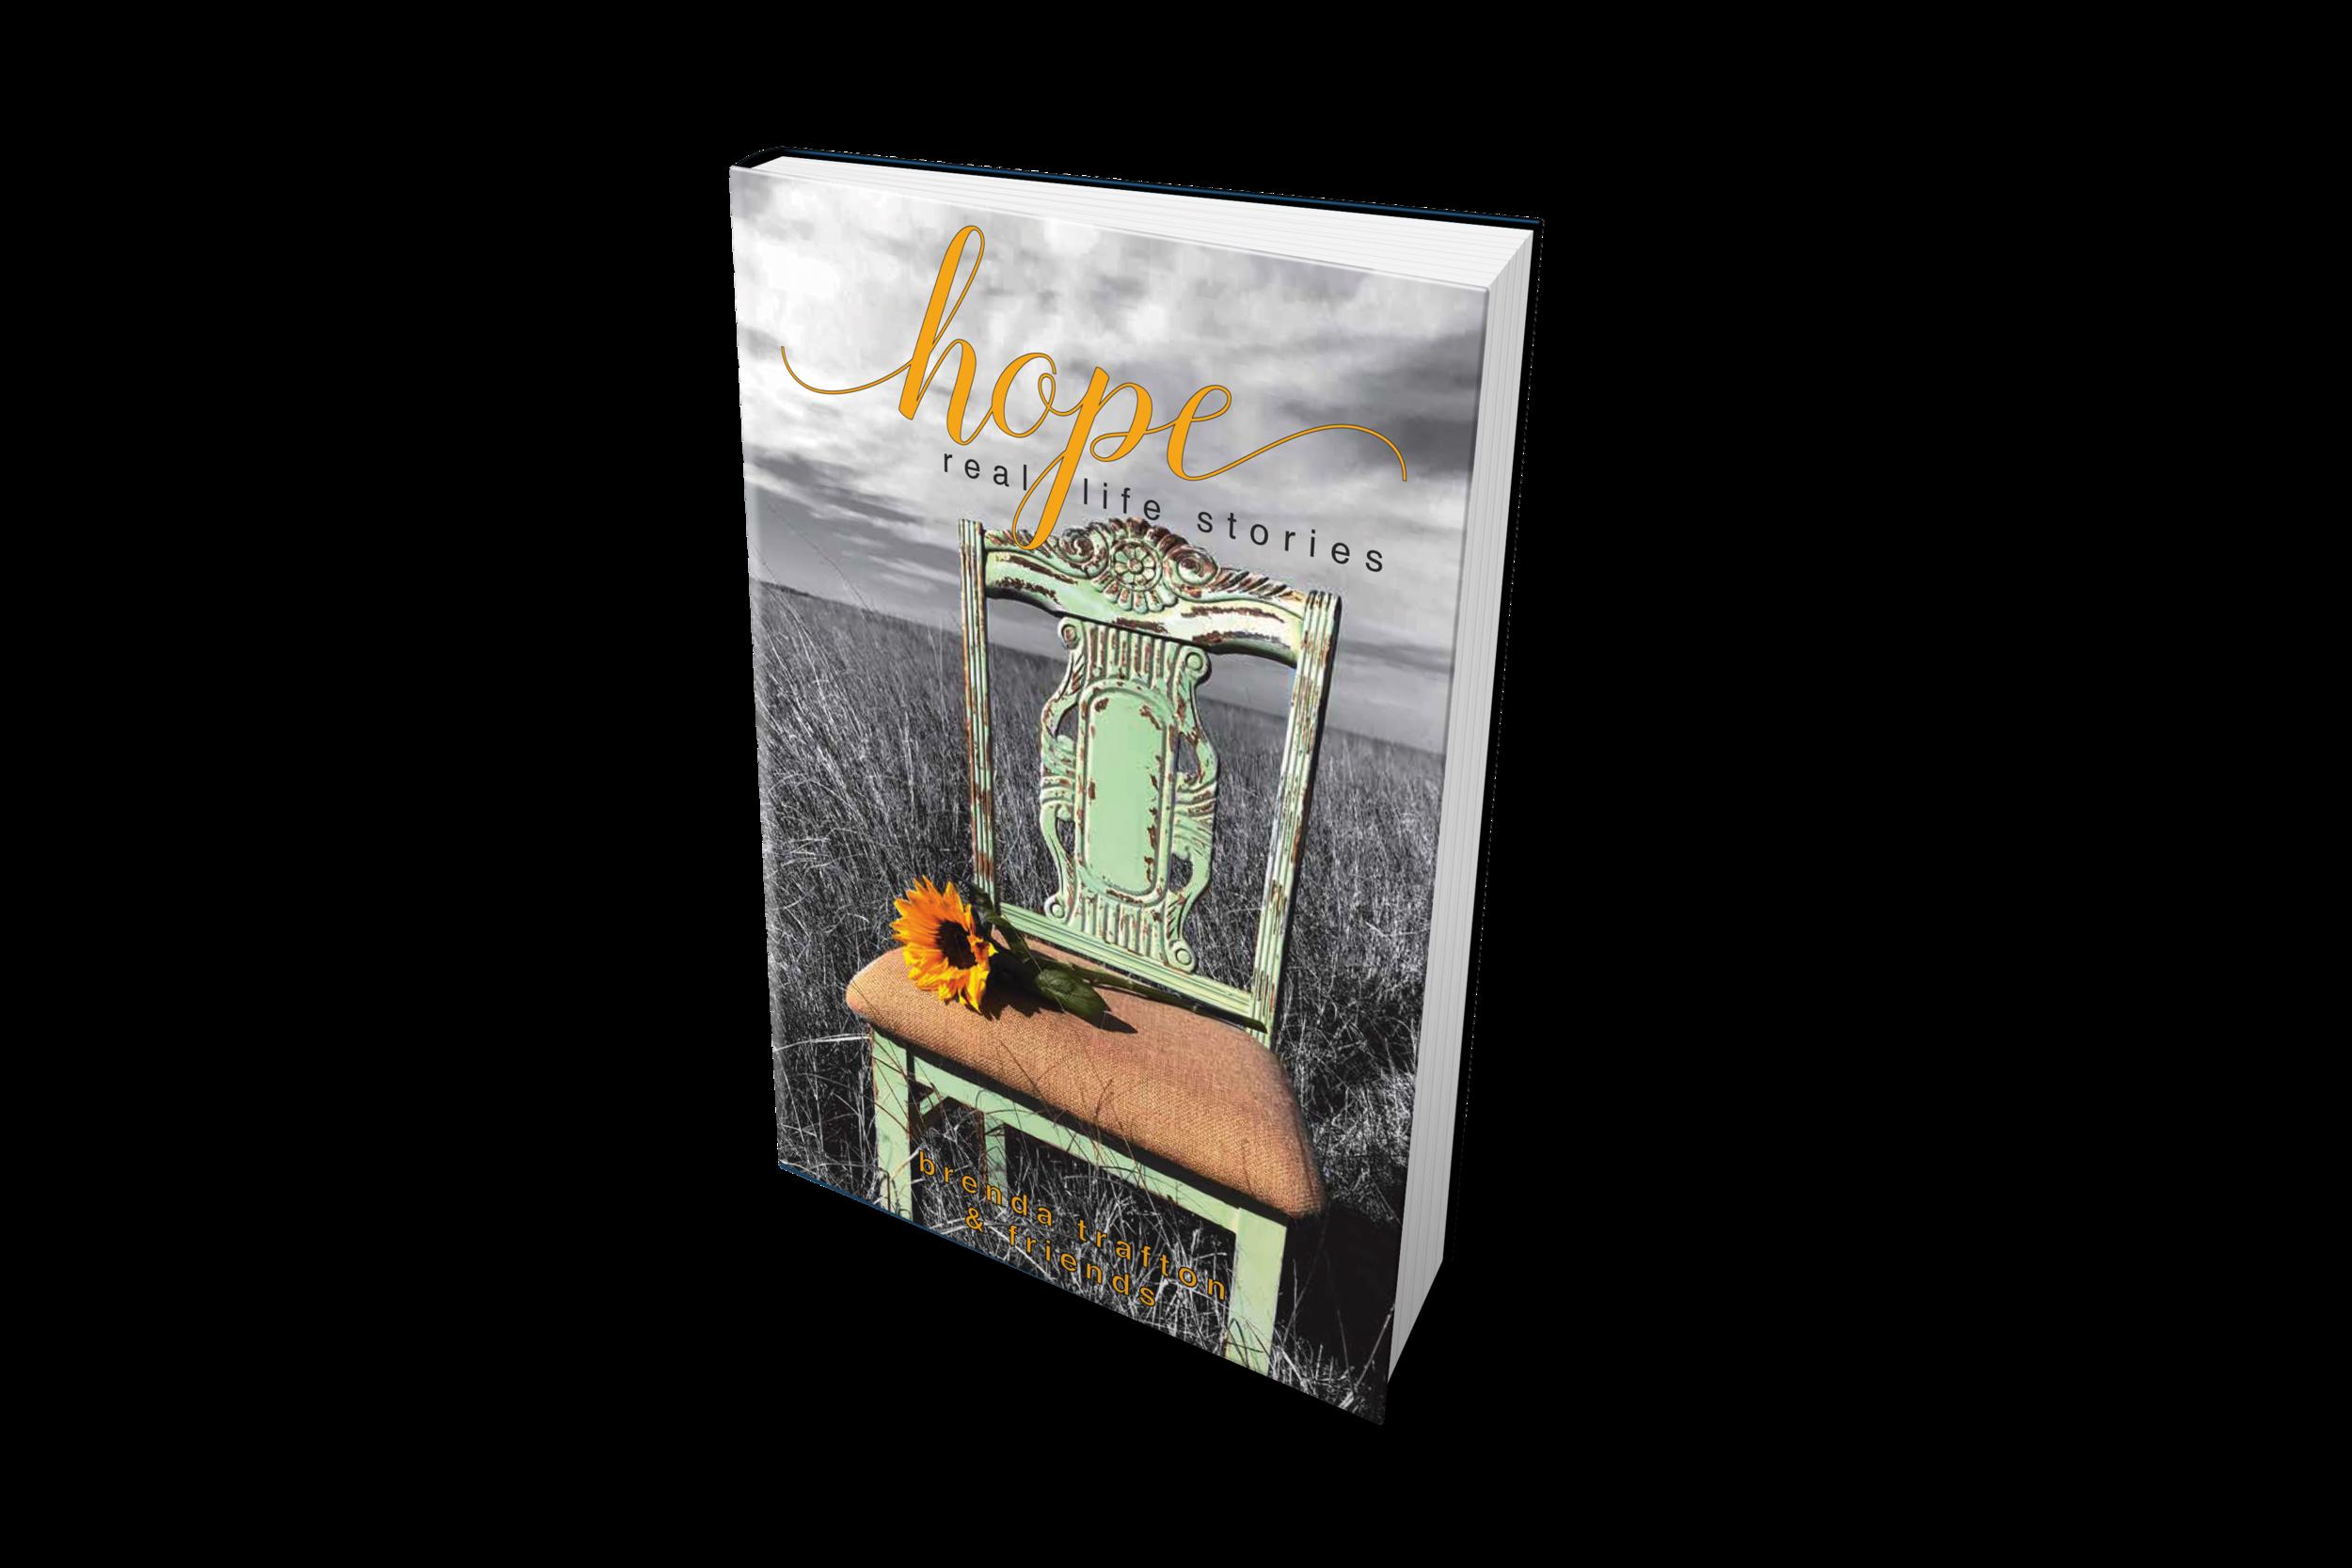 069 6x9 Hardcover Ebook Mockup COVERVAULT